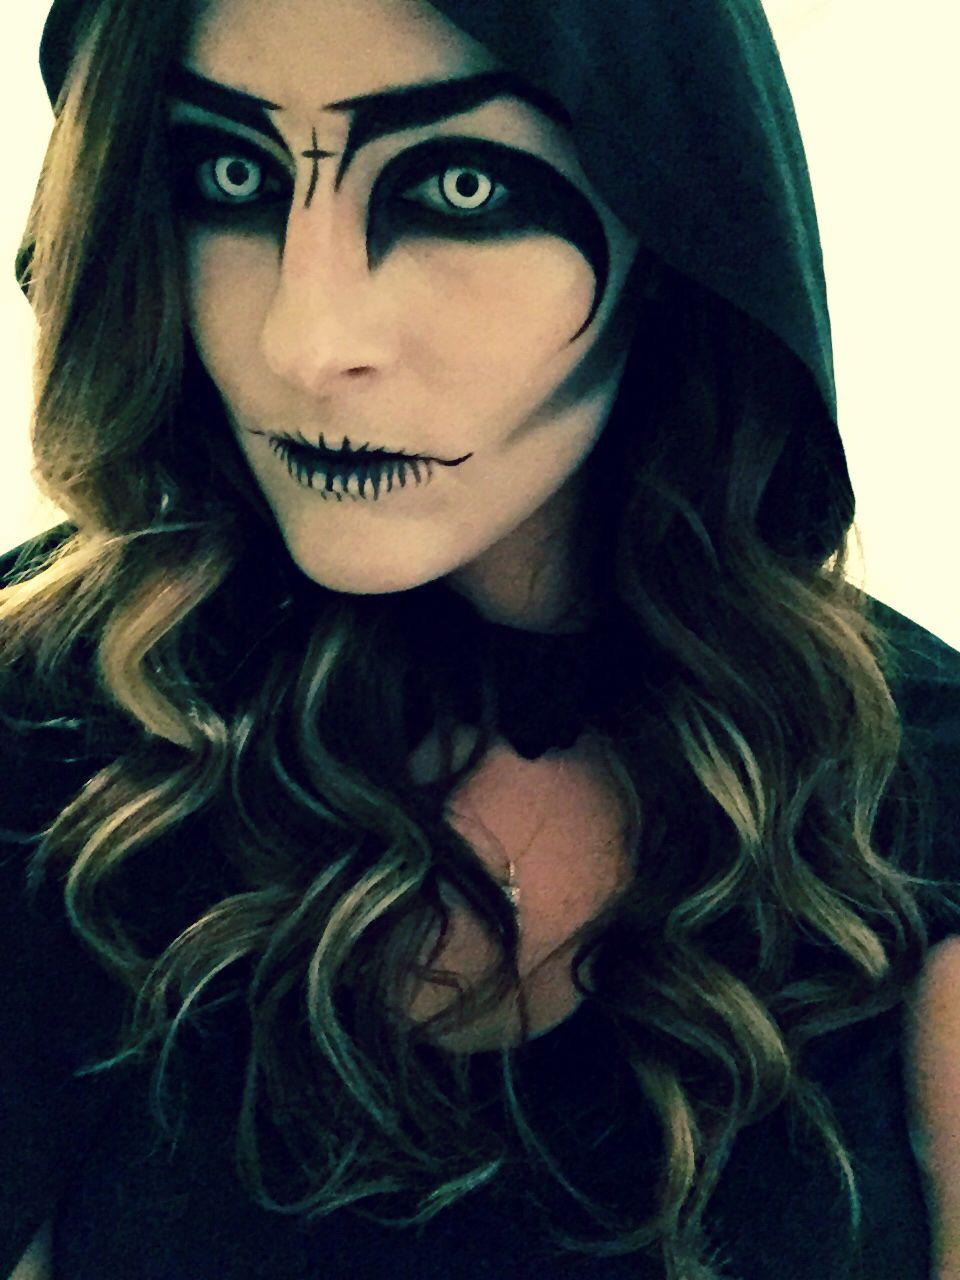 Easy Grim Reaper Makeup : reaper, makeup, Reaper, #makeup, #halloweenmakeup, #halloween, #grimreaper, #demon, #scarymakeup, #spooky, #ar…, Halloween, Costumes, Makeup,, Makeup, Witch